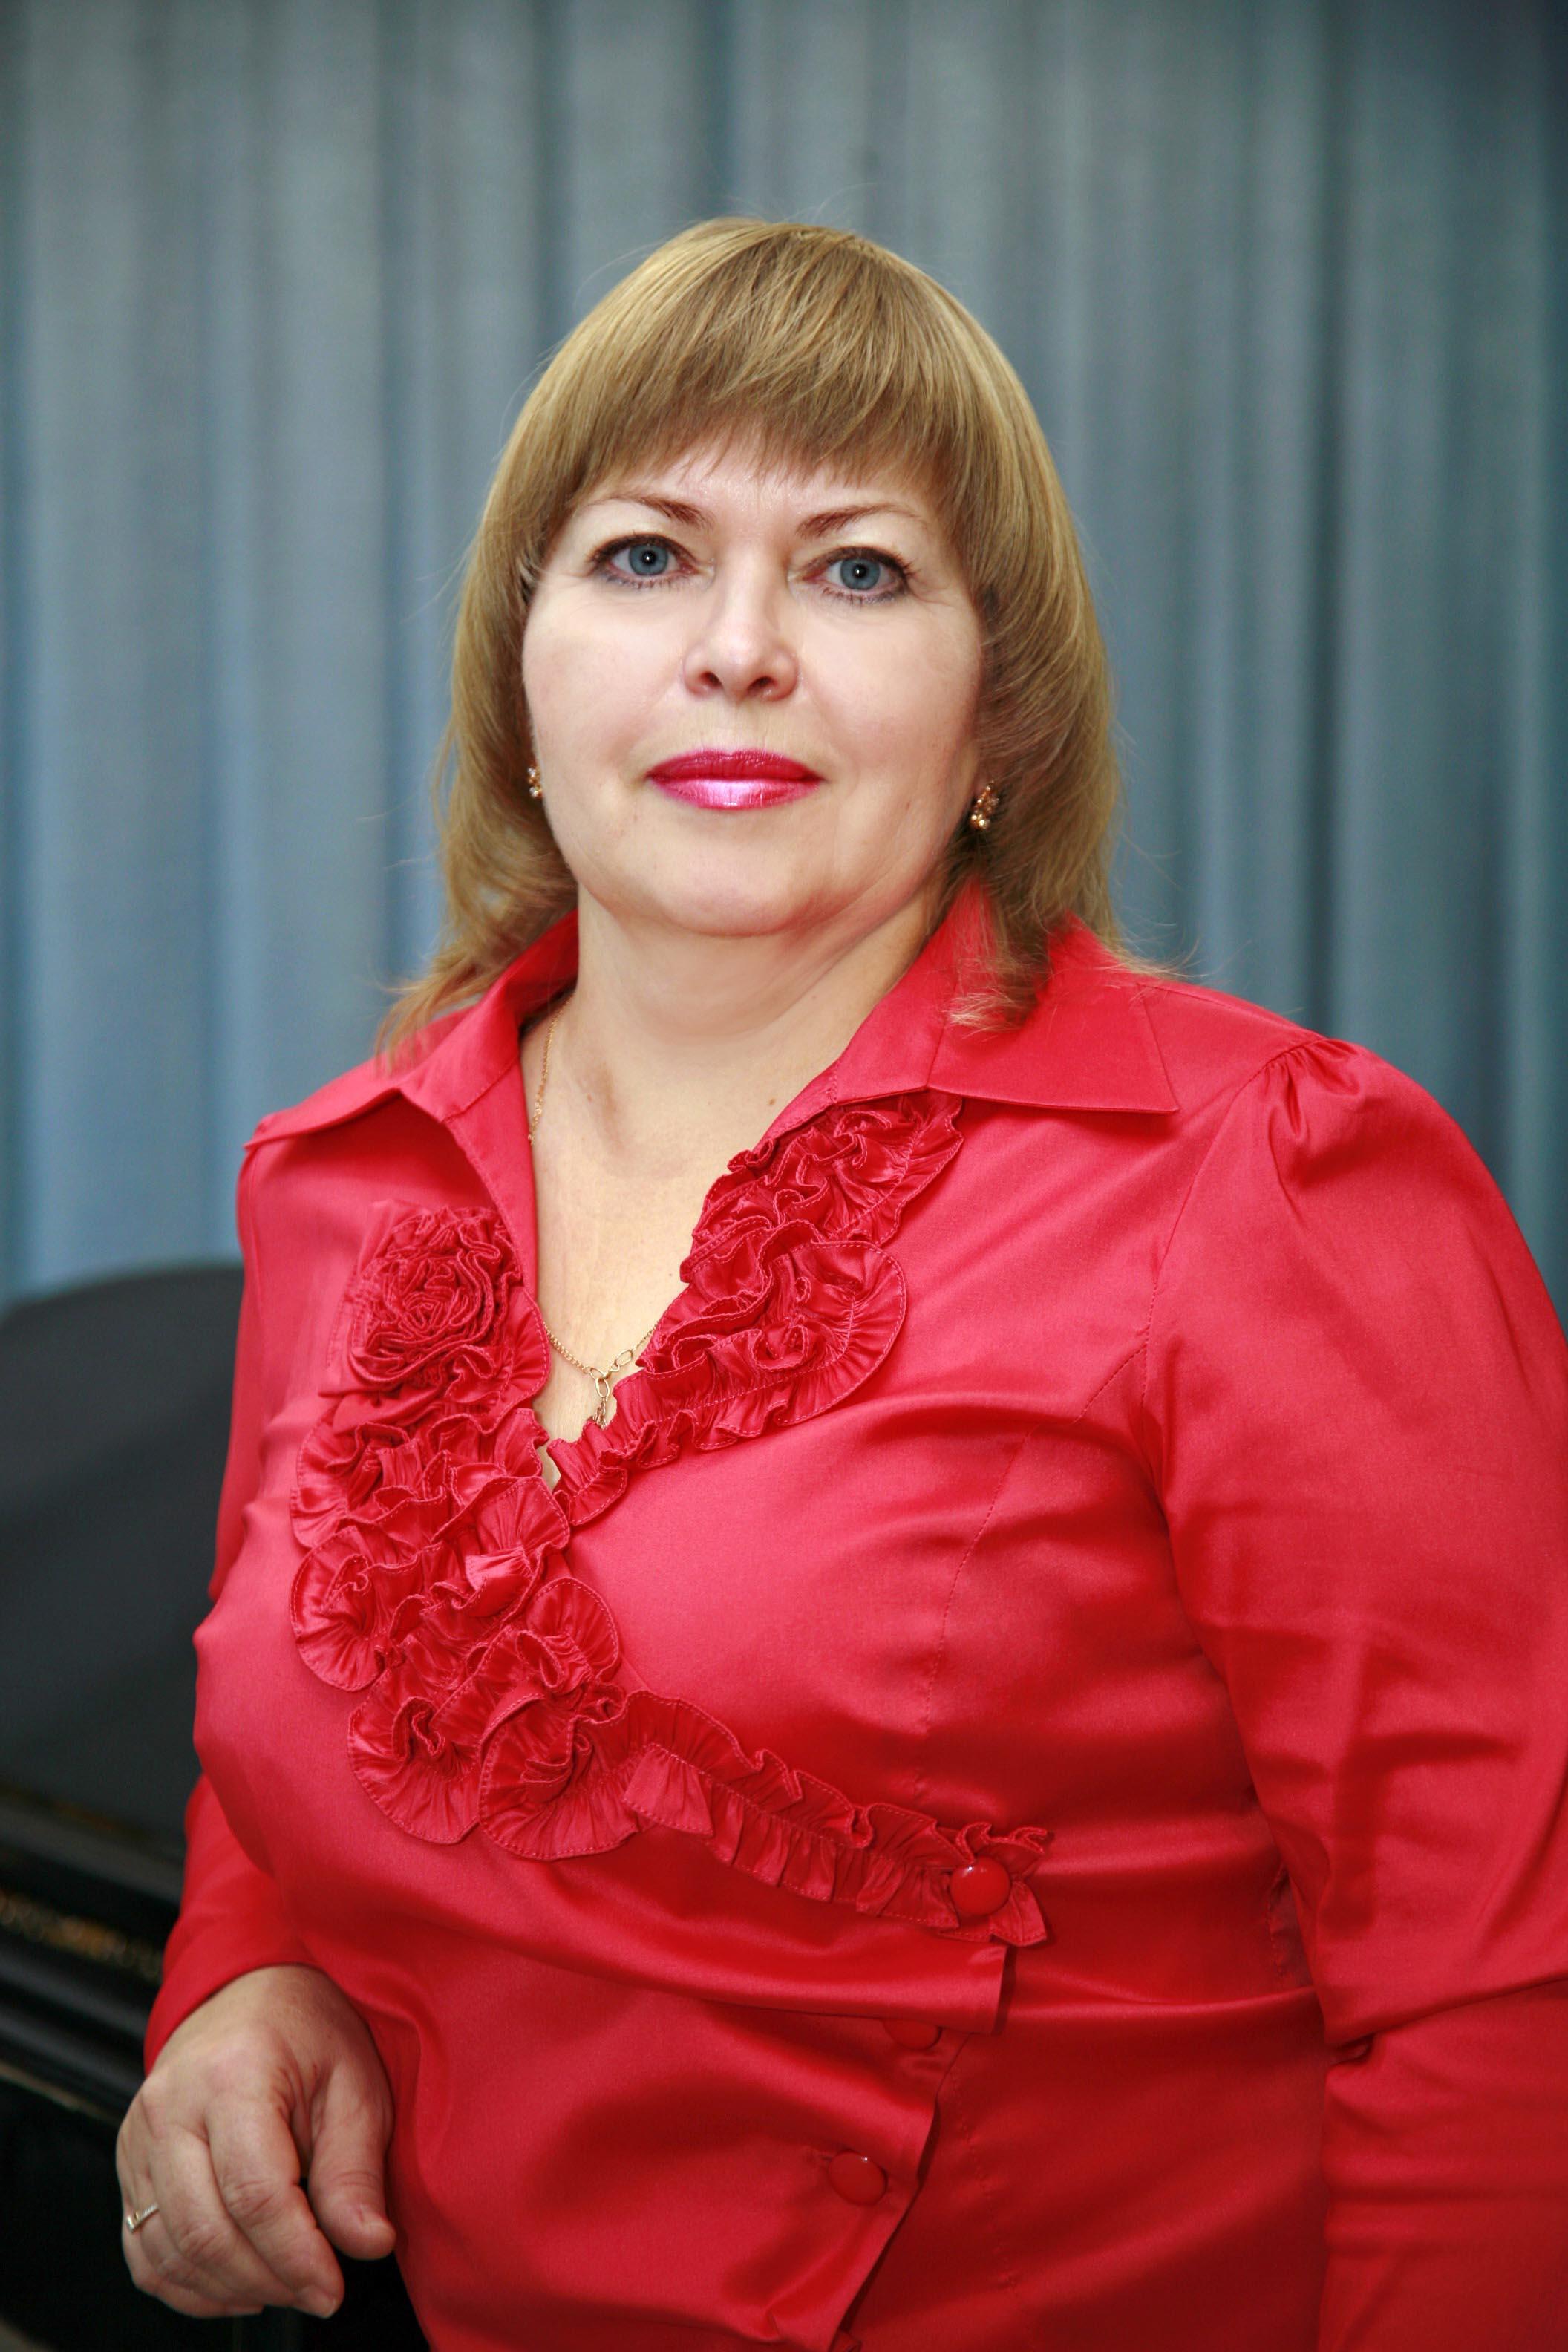 Дружинина Антонина Викторовна